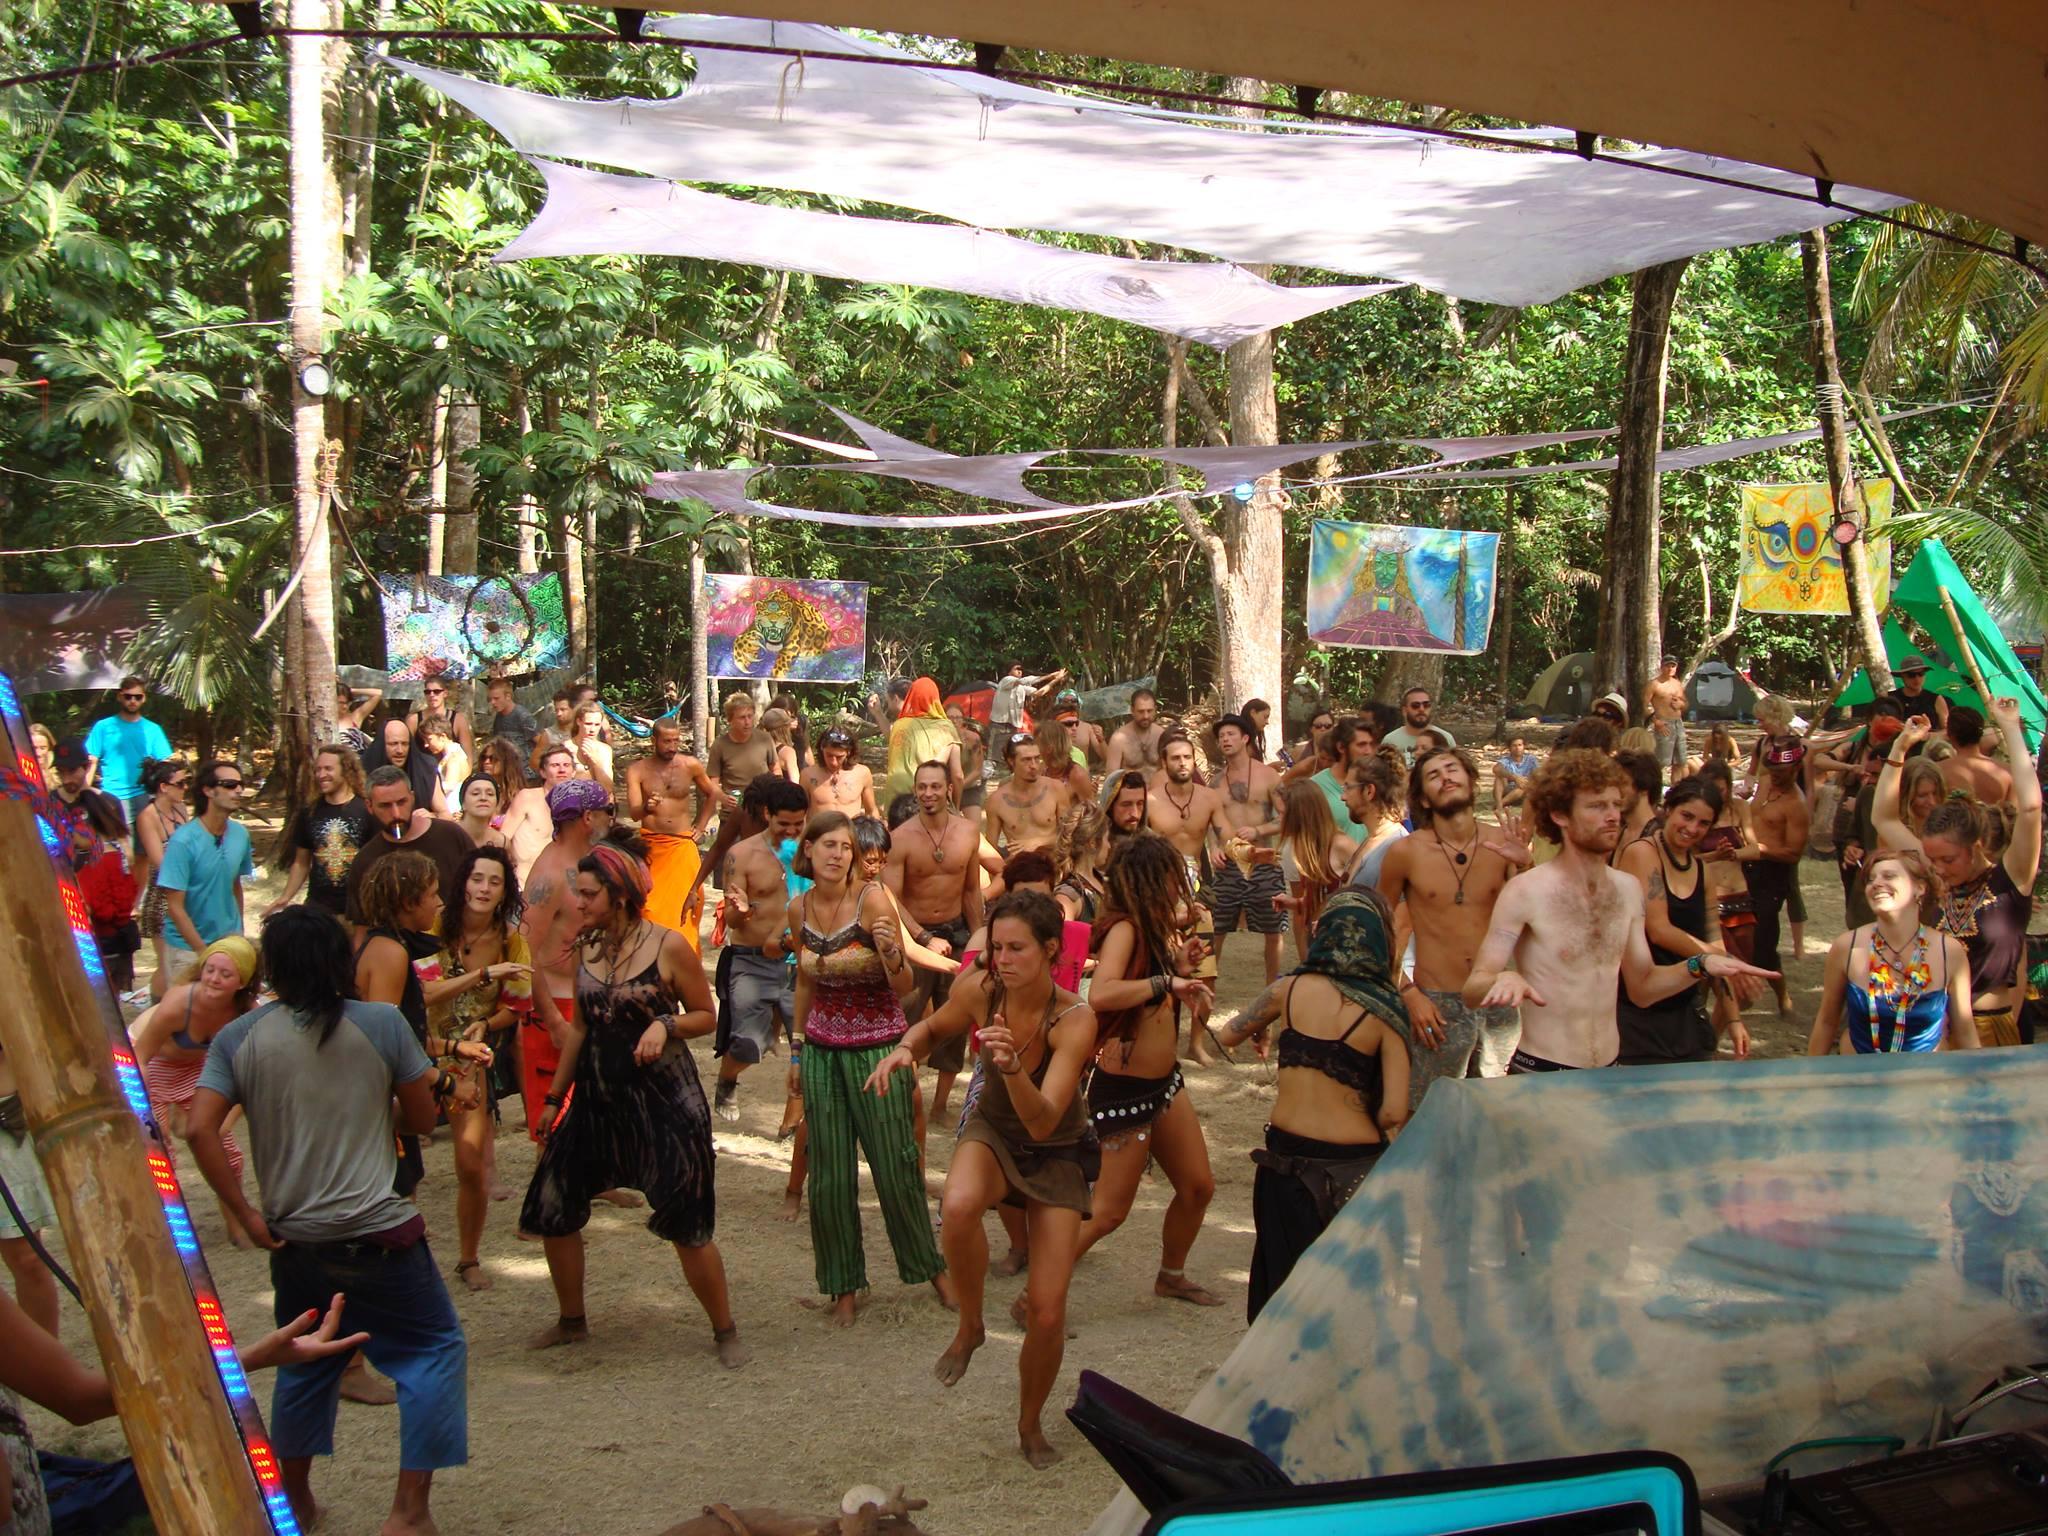 Afterhours sex party at spring break part 2 - 3 part 1